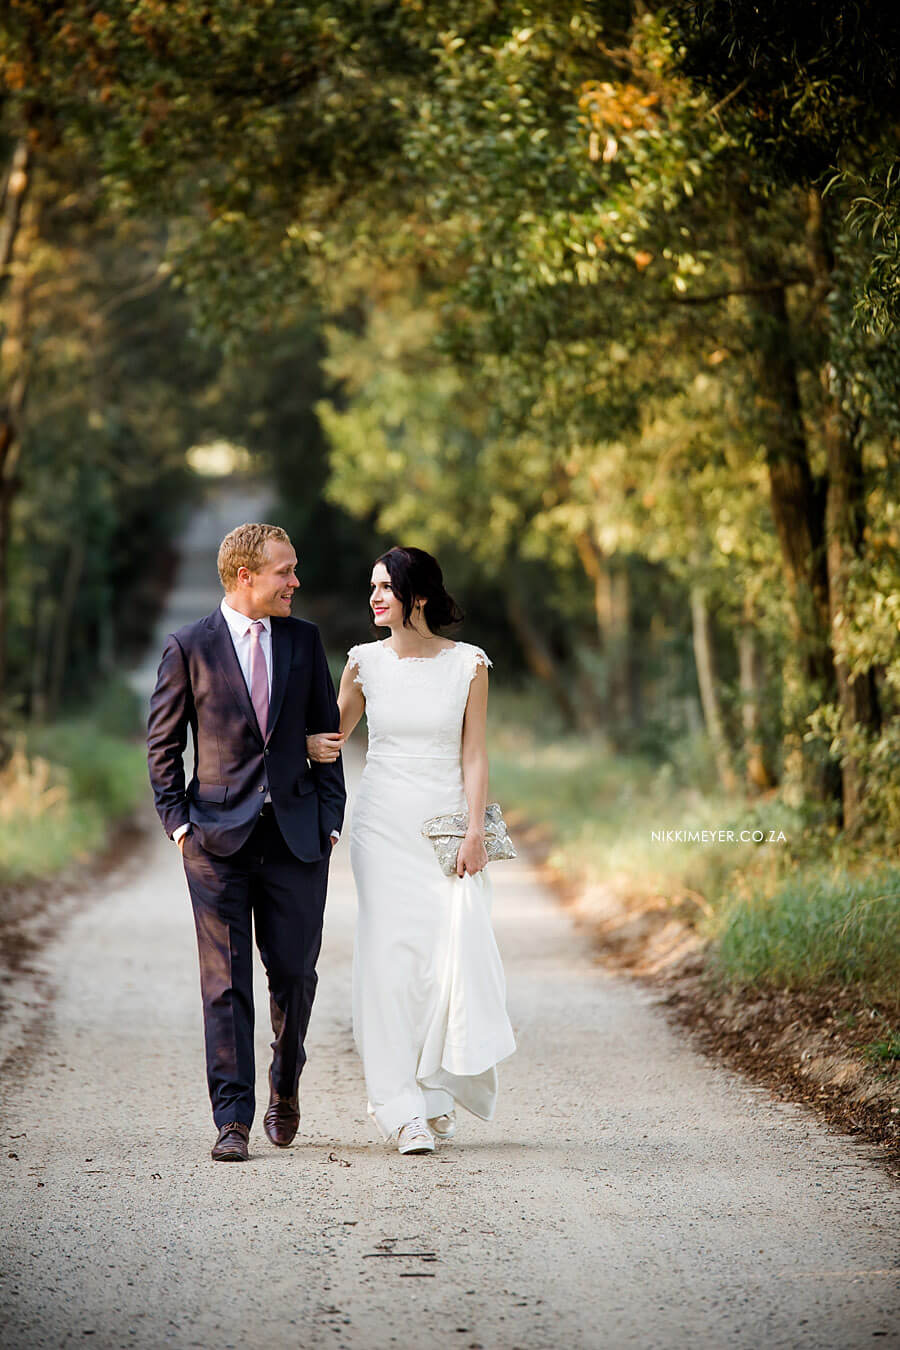 nikki-meyer_wedding-photographer_george_052